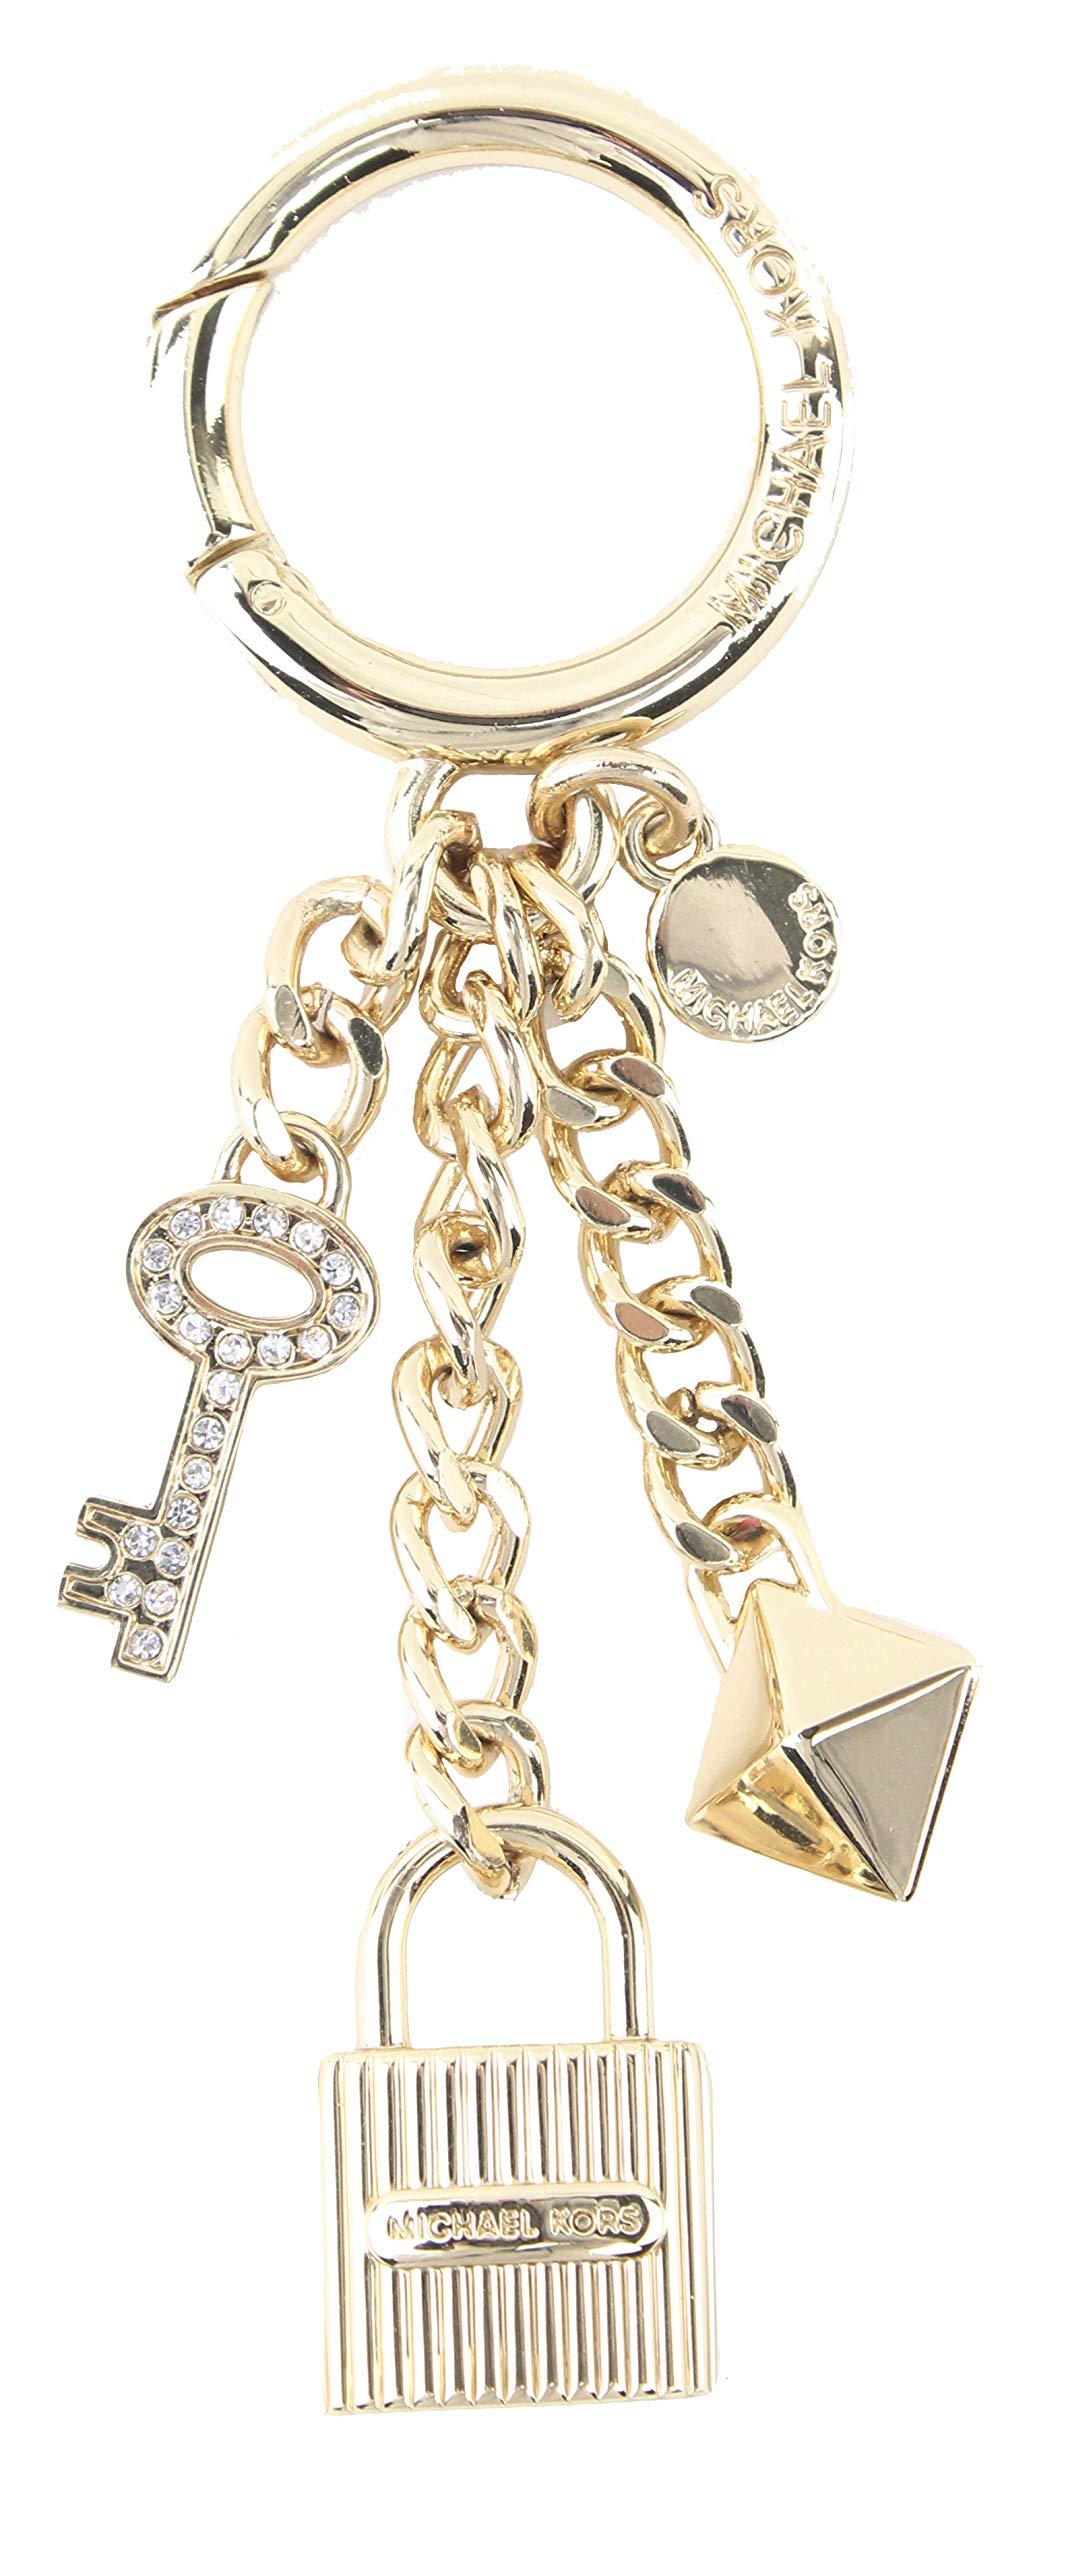 MICHAEL Michael Kors Gold Lock and Pave Key Handbag Charm Key Fob Keychain with Gift Box, Style 35F8SKCK7U